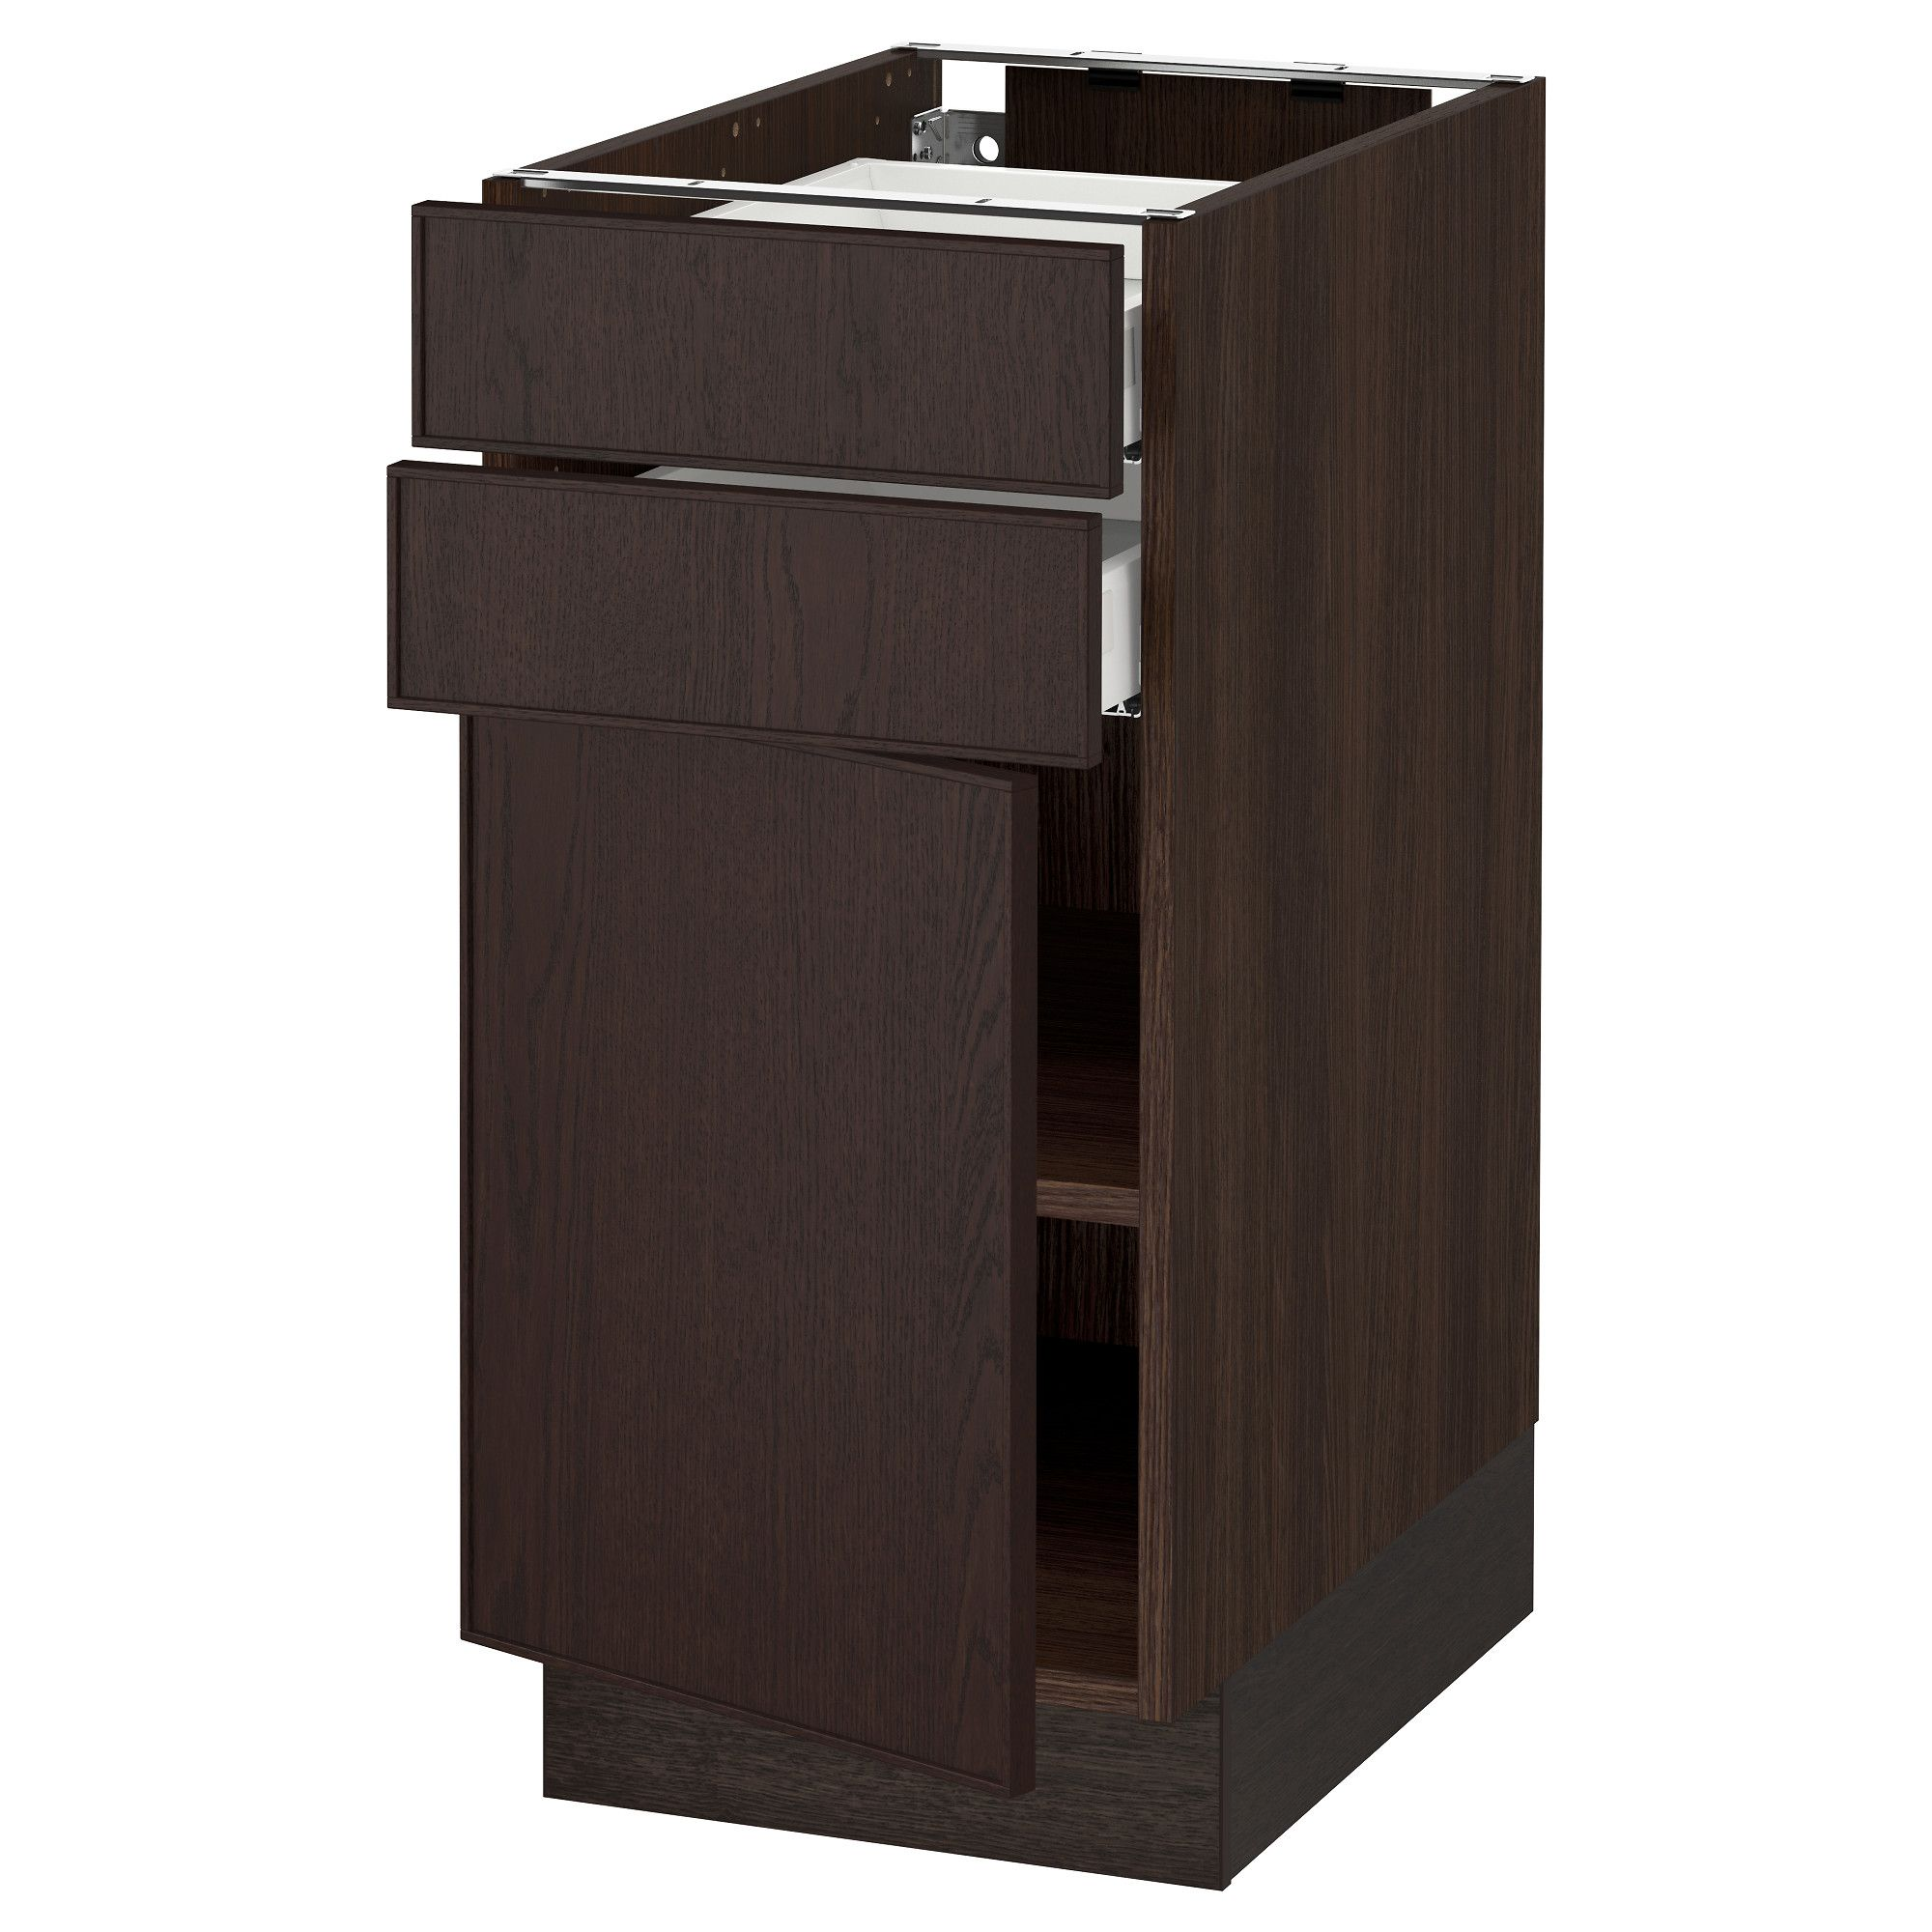 Furniture and Home Furnishings   Base cabinets, Ikea ...